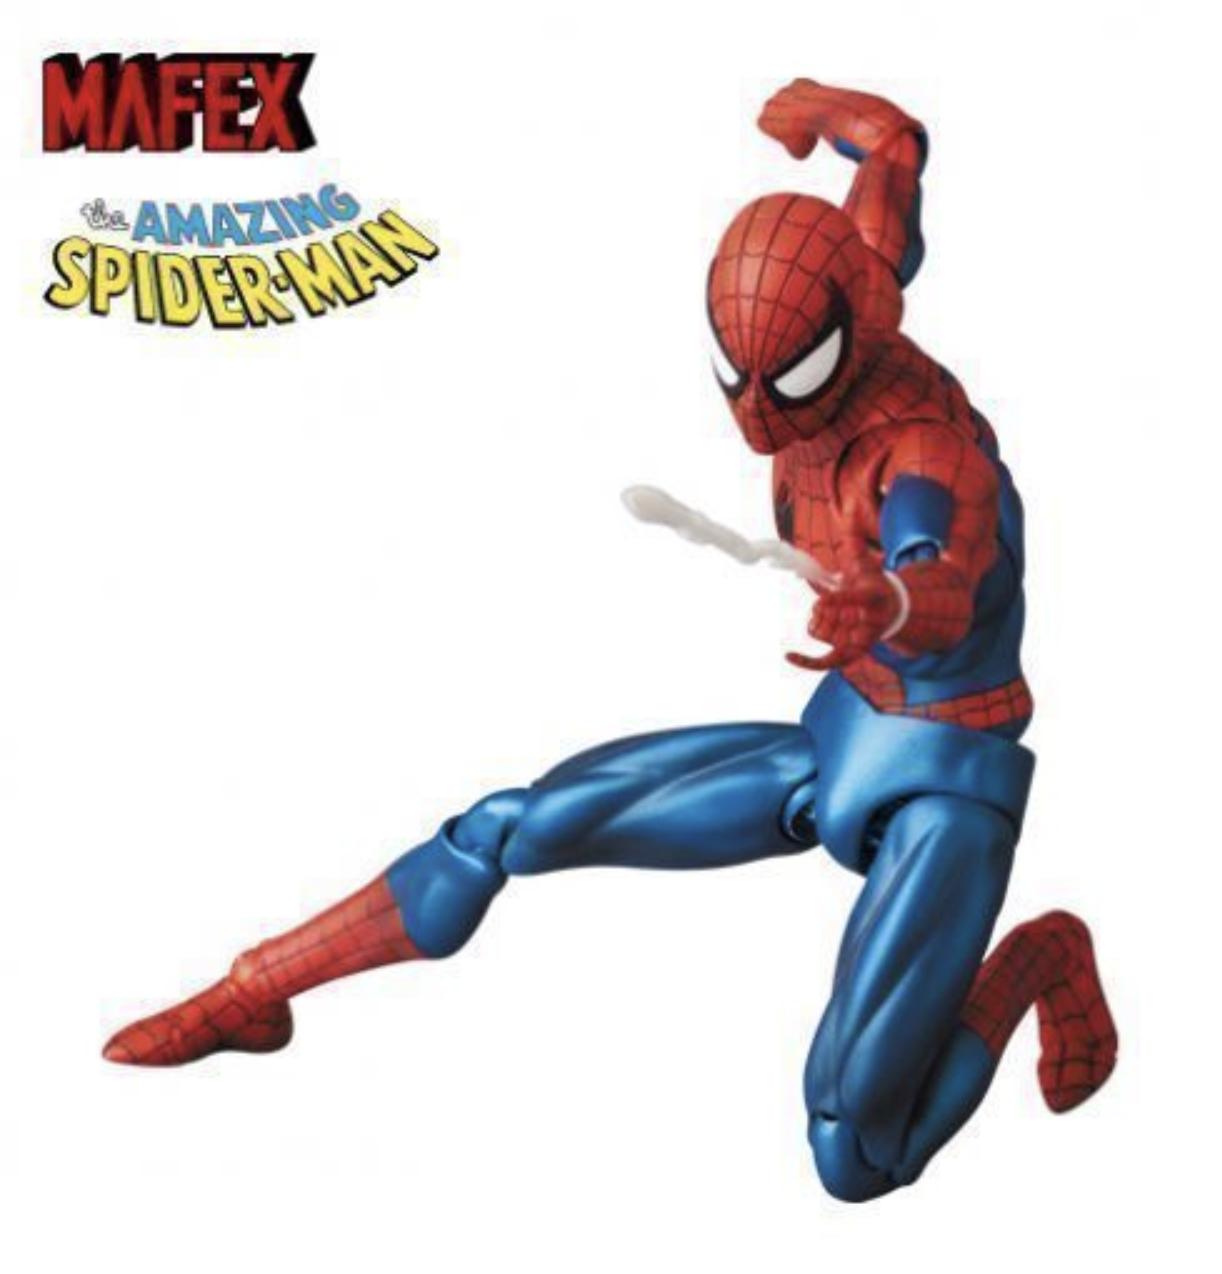 AUTHENTIC Mafex Medicom Spider-Man Comic Version Spiderman 075 New US SELLER